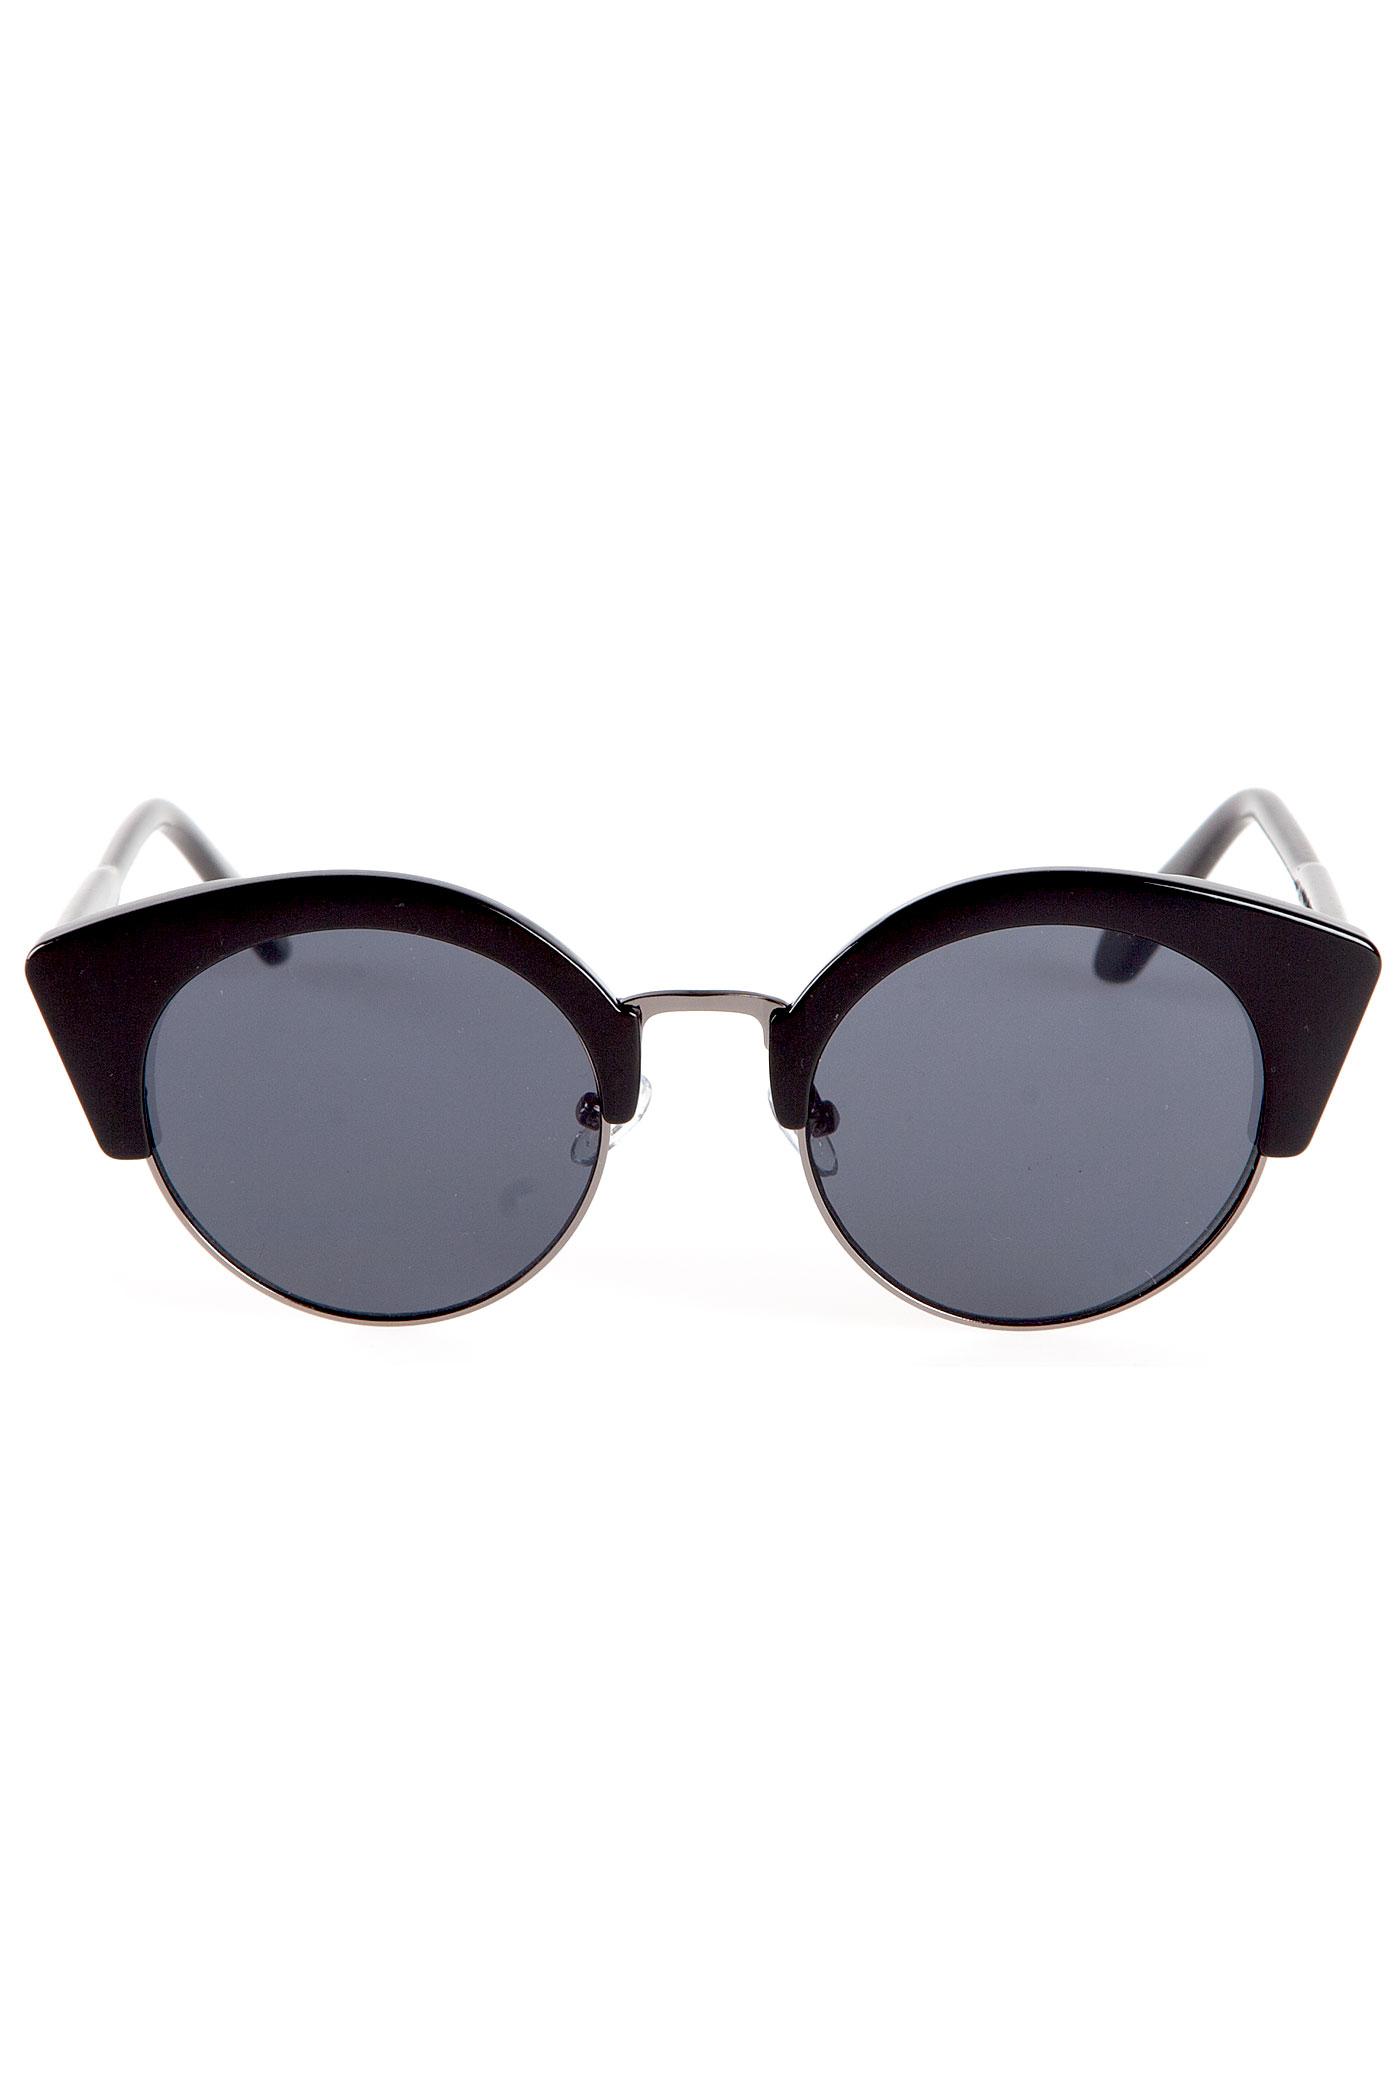 cheap sunglasses outlet review www panaust au